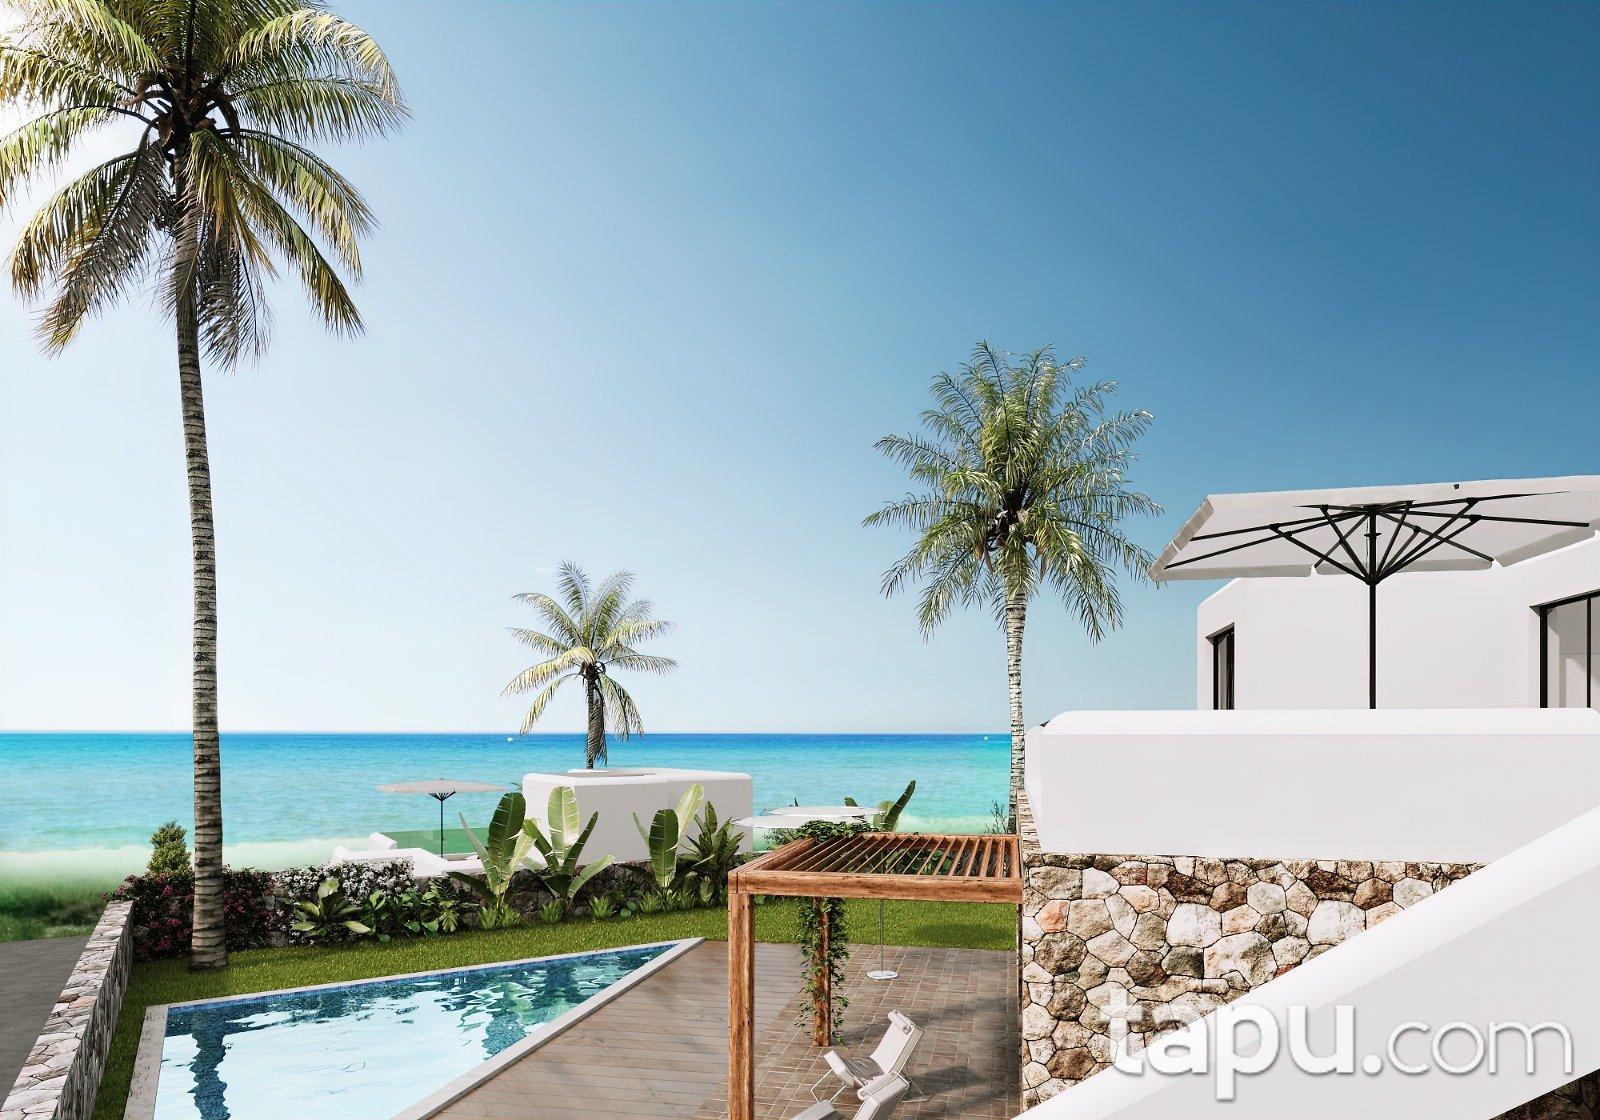 Kıbrıs Aqua View Konsept Proje'sinde Lüks Villalar